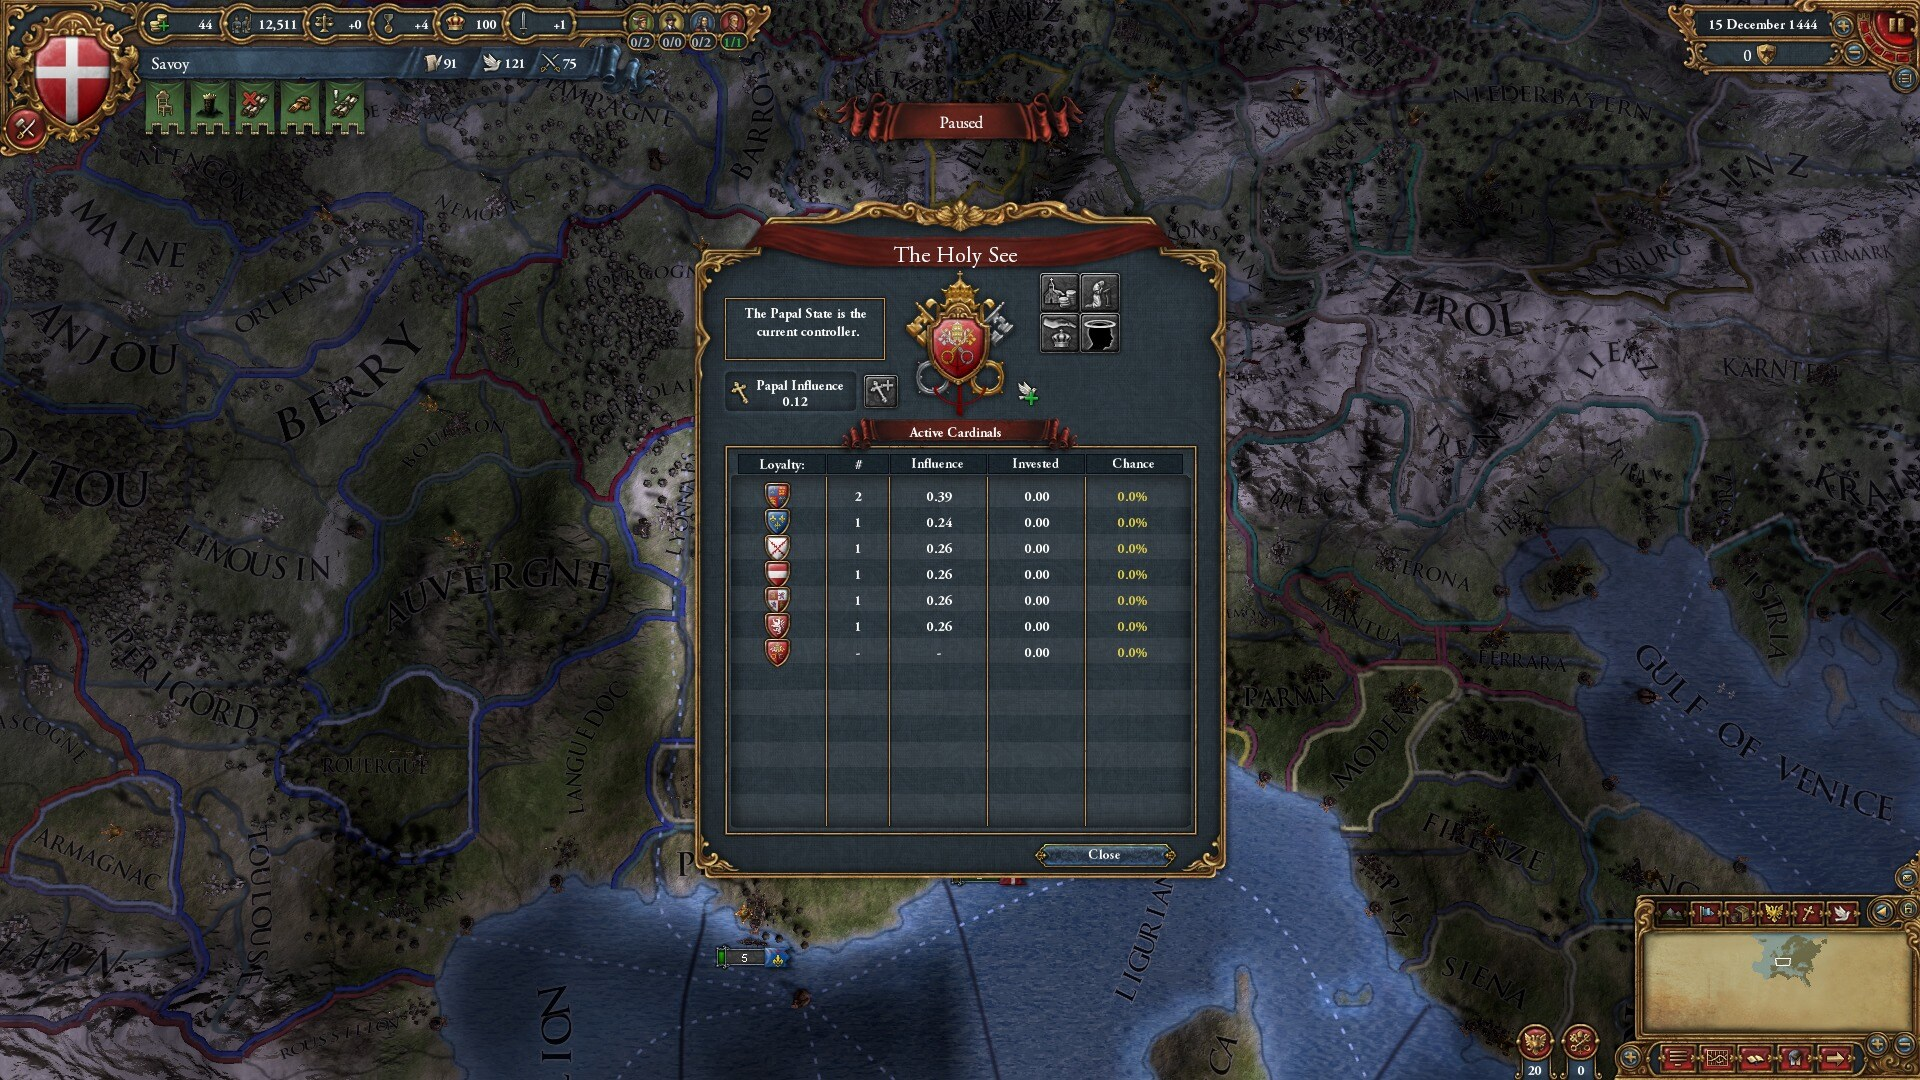 Europa Universalis IV: Art of War (PC) - Steam Key - GLOBAL - 3